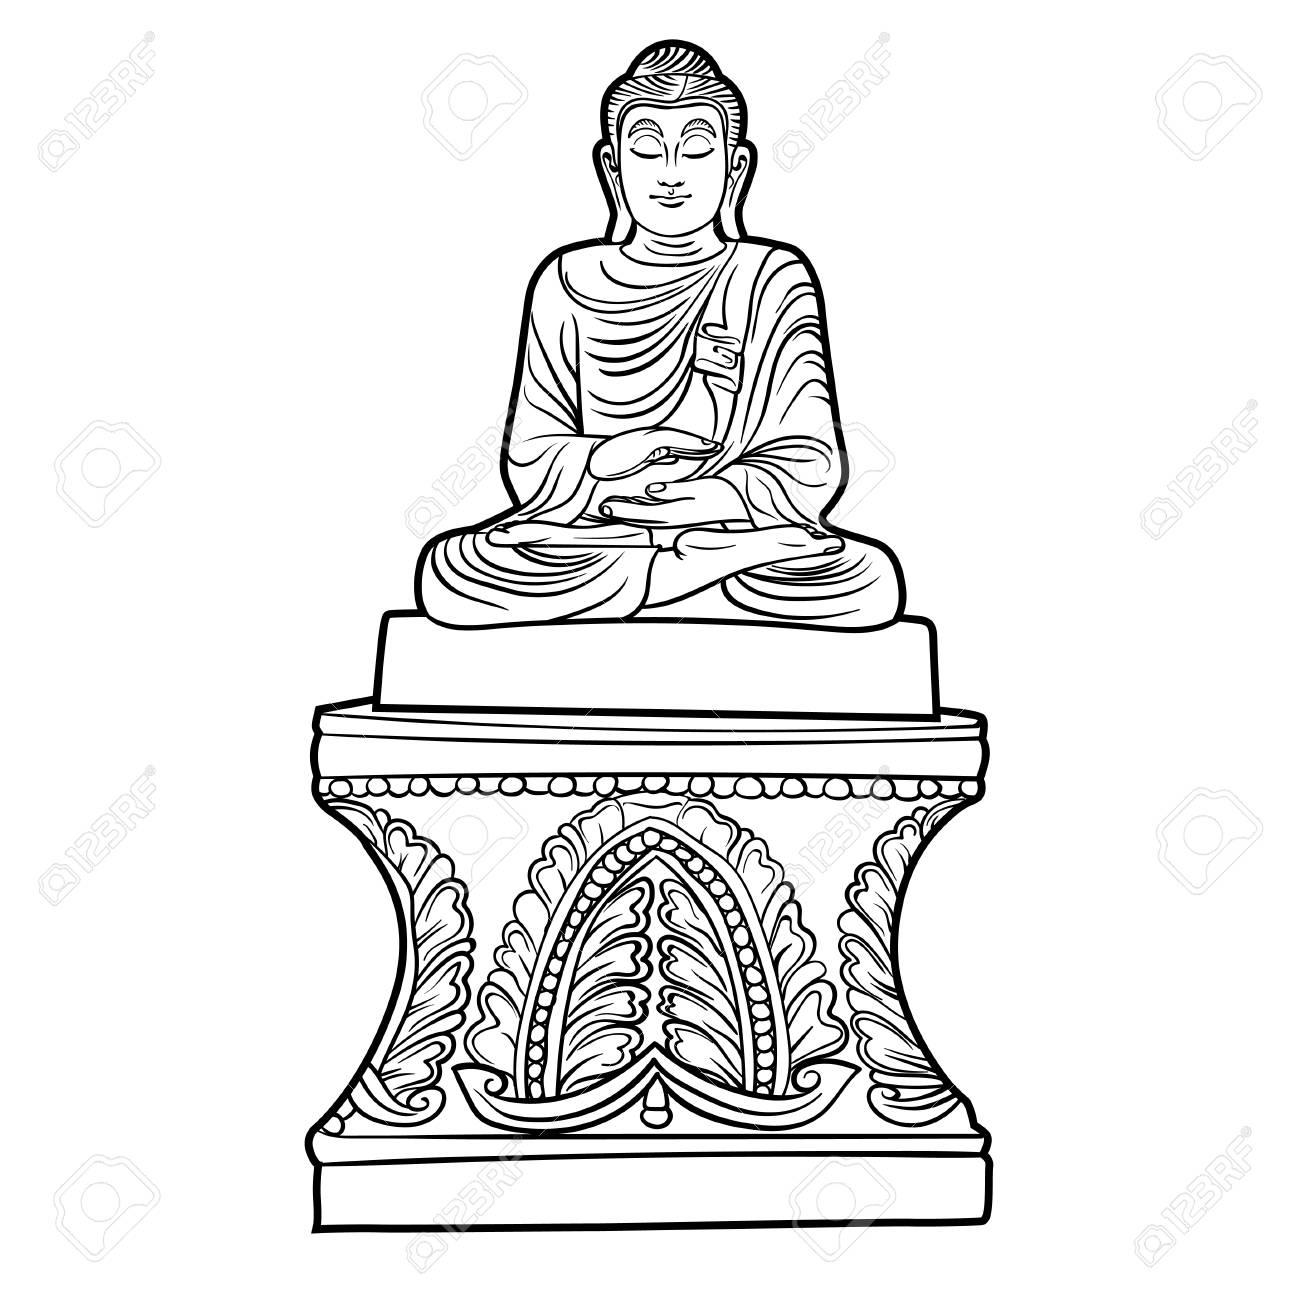 8834a7ff80272 Buddha isolated on white. Esoteric vintage illustration. Indian, Buddhism,  spiritual art.